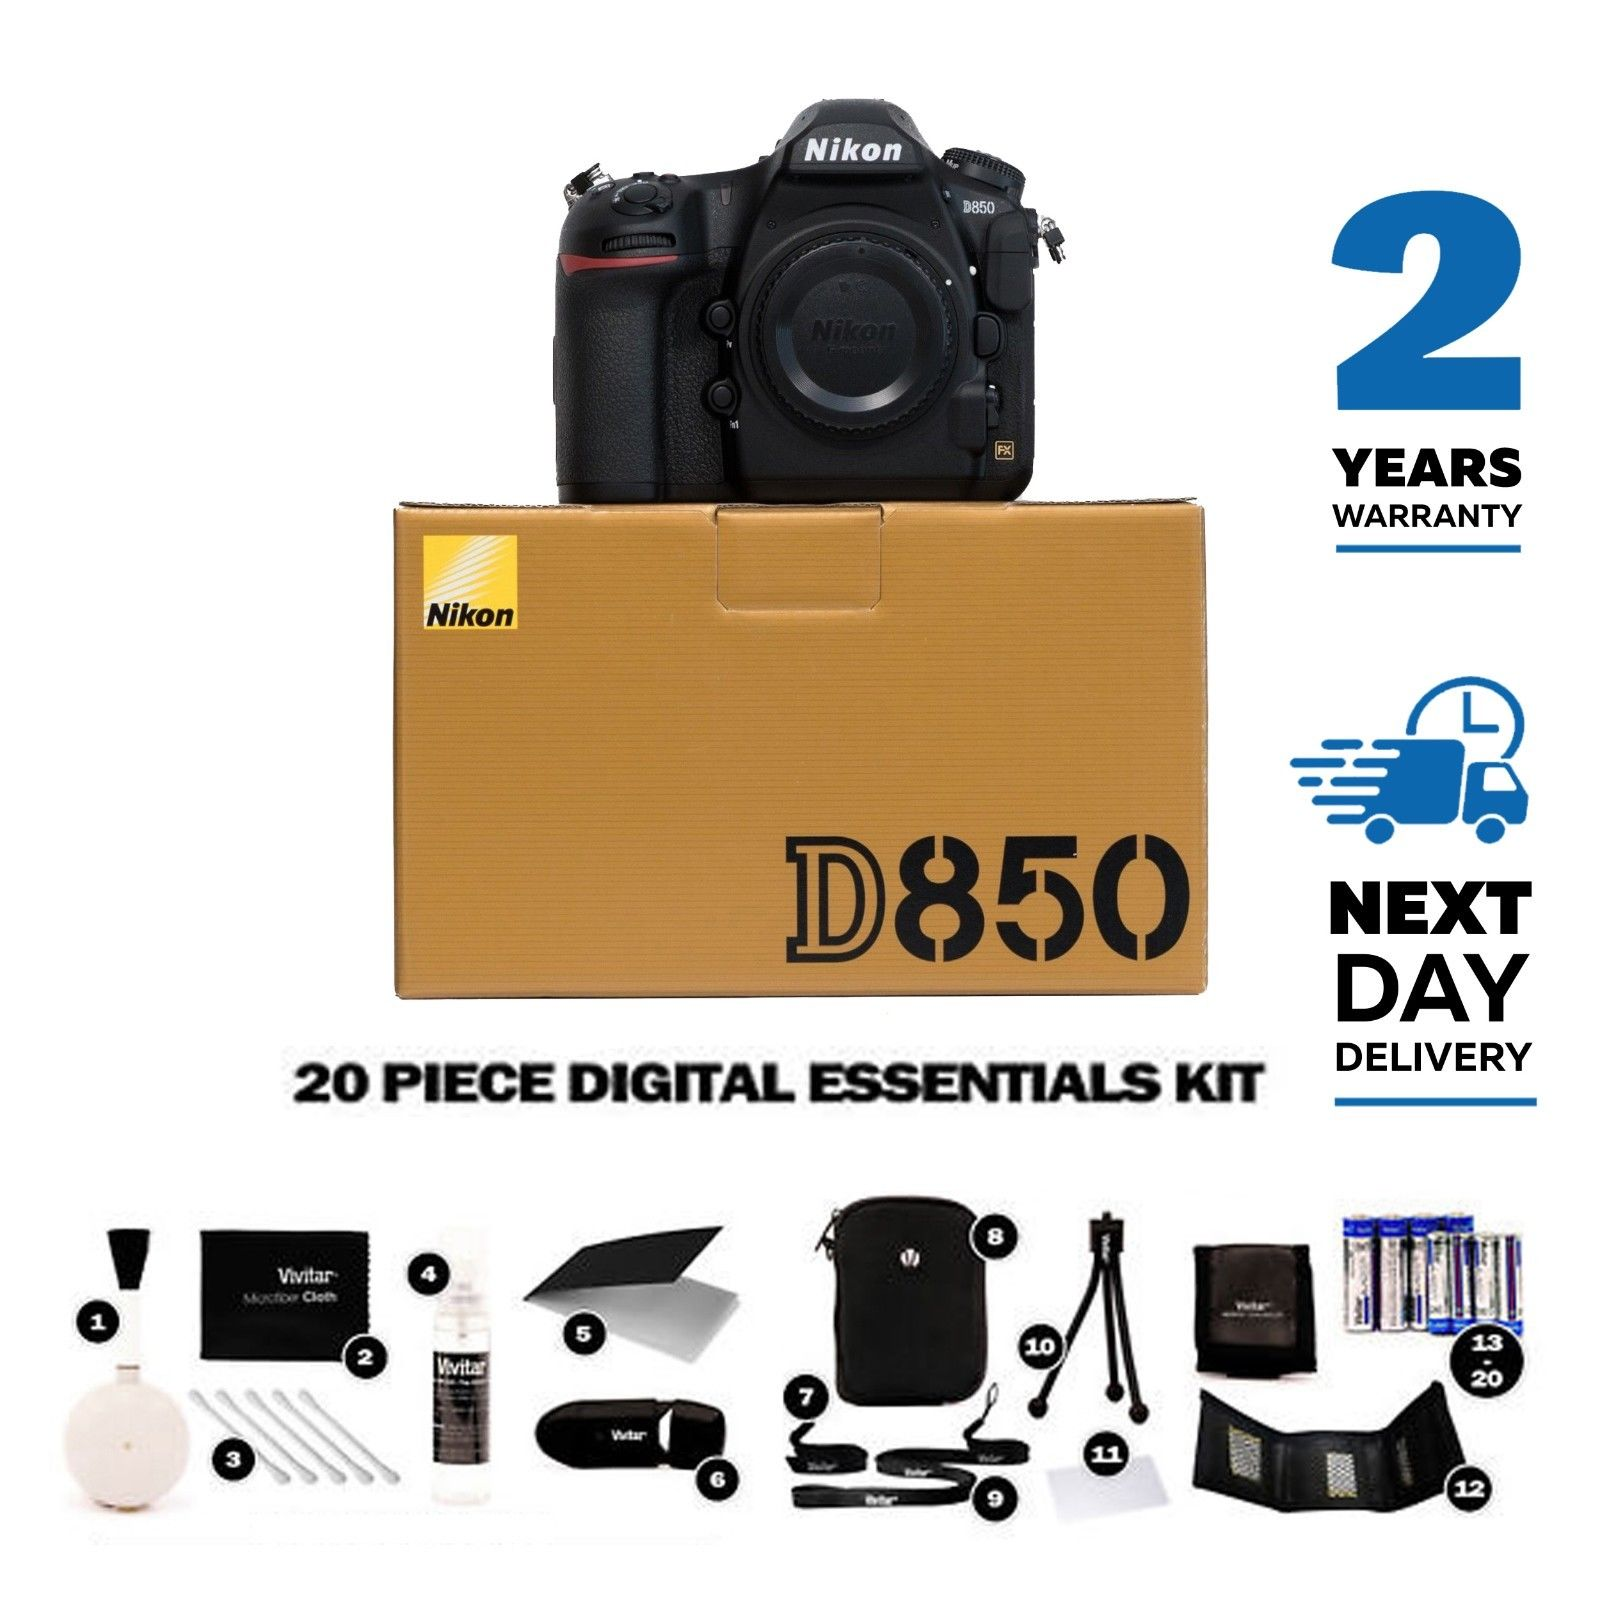 New Nikon D850 45.7MP DSLR Camera Body, Multi Languages, 2 Year Warranty